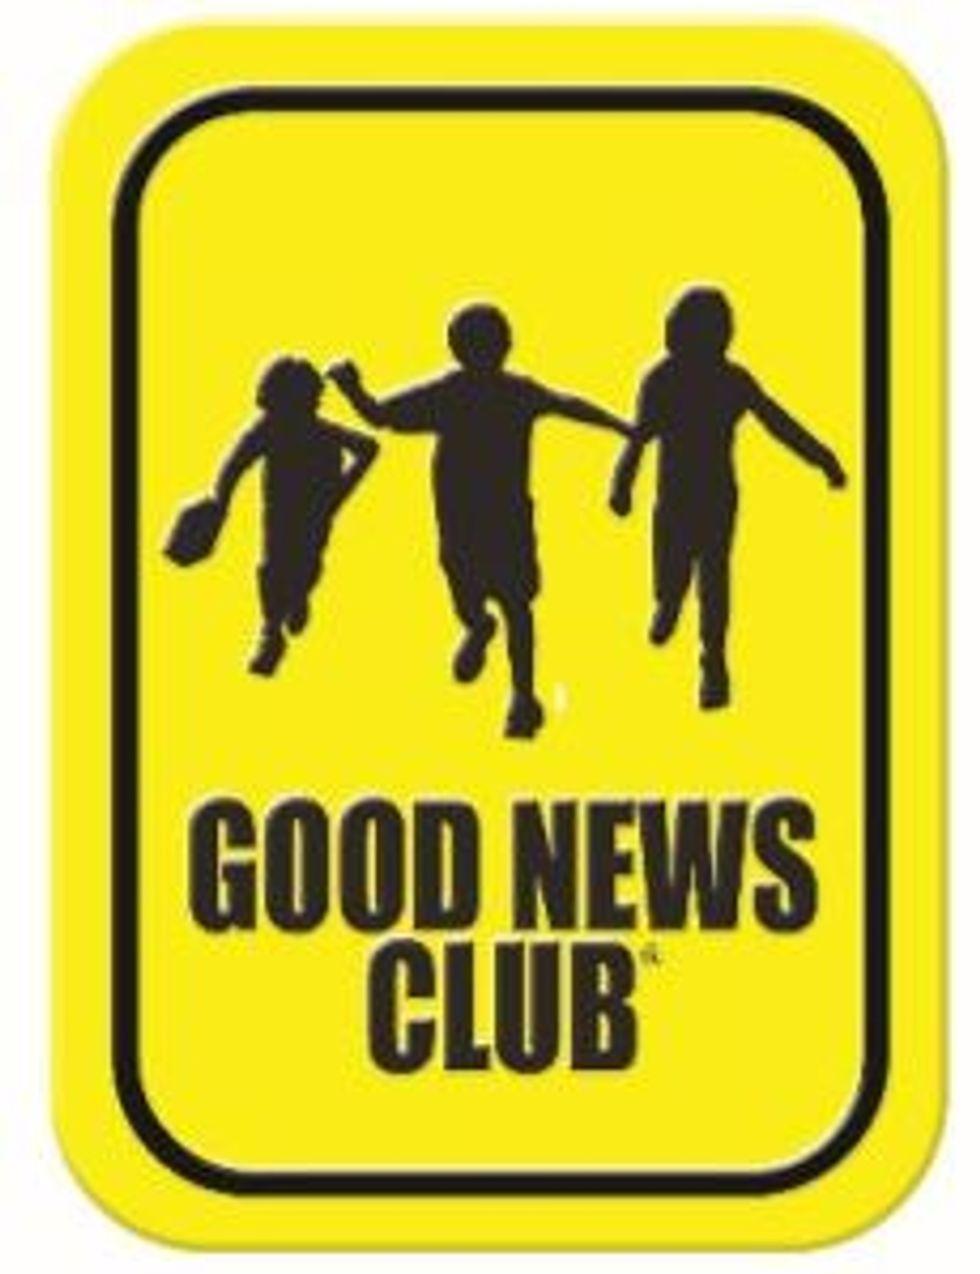 Good news club sign